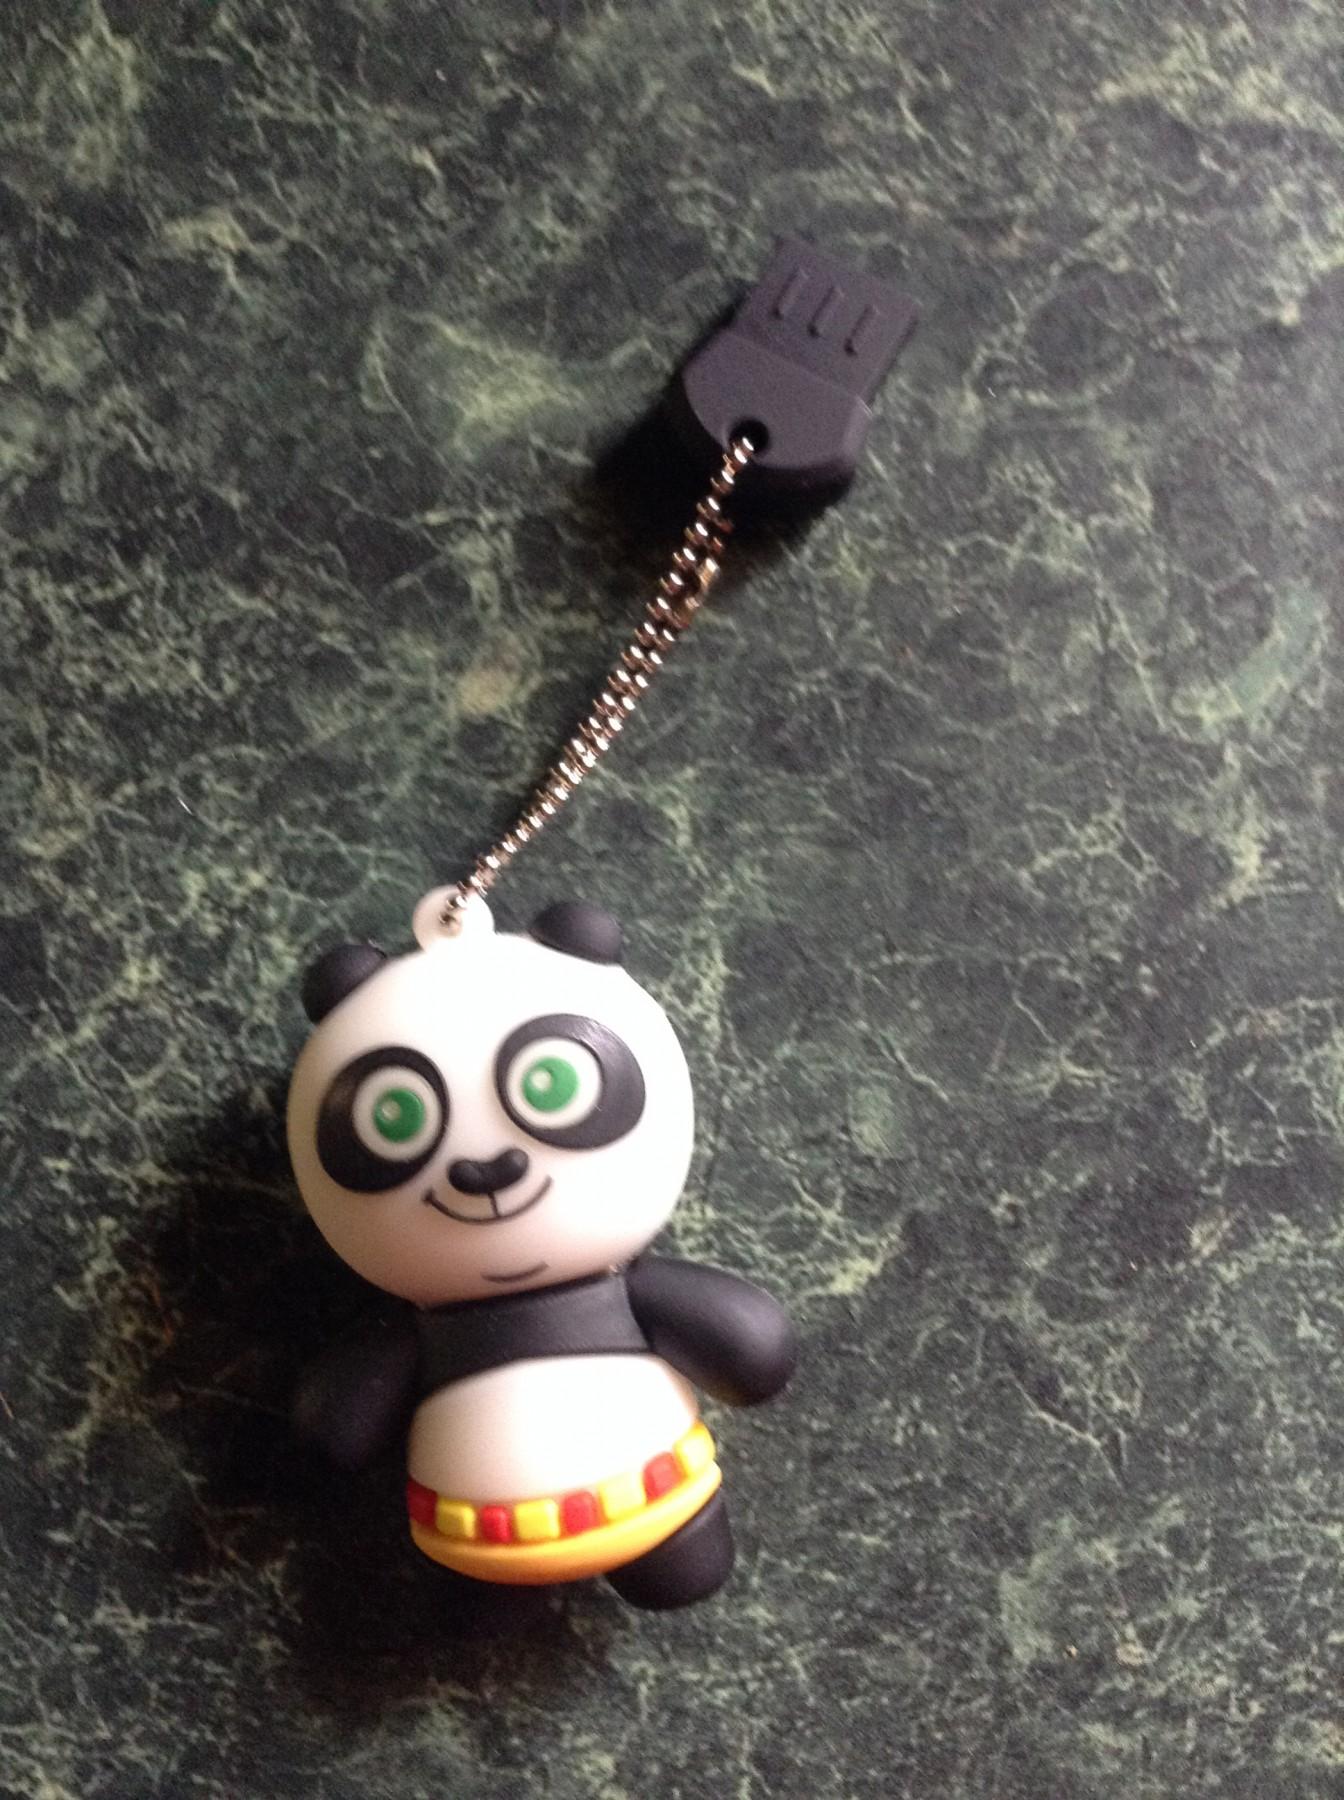 KungFu Panda!